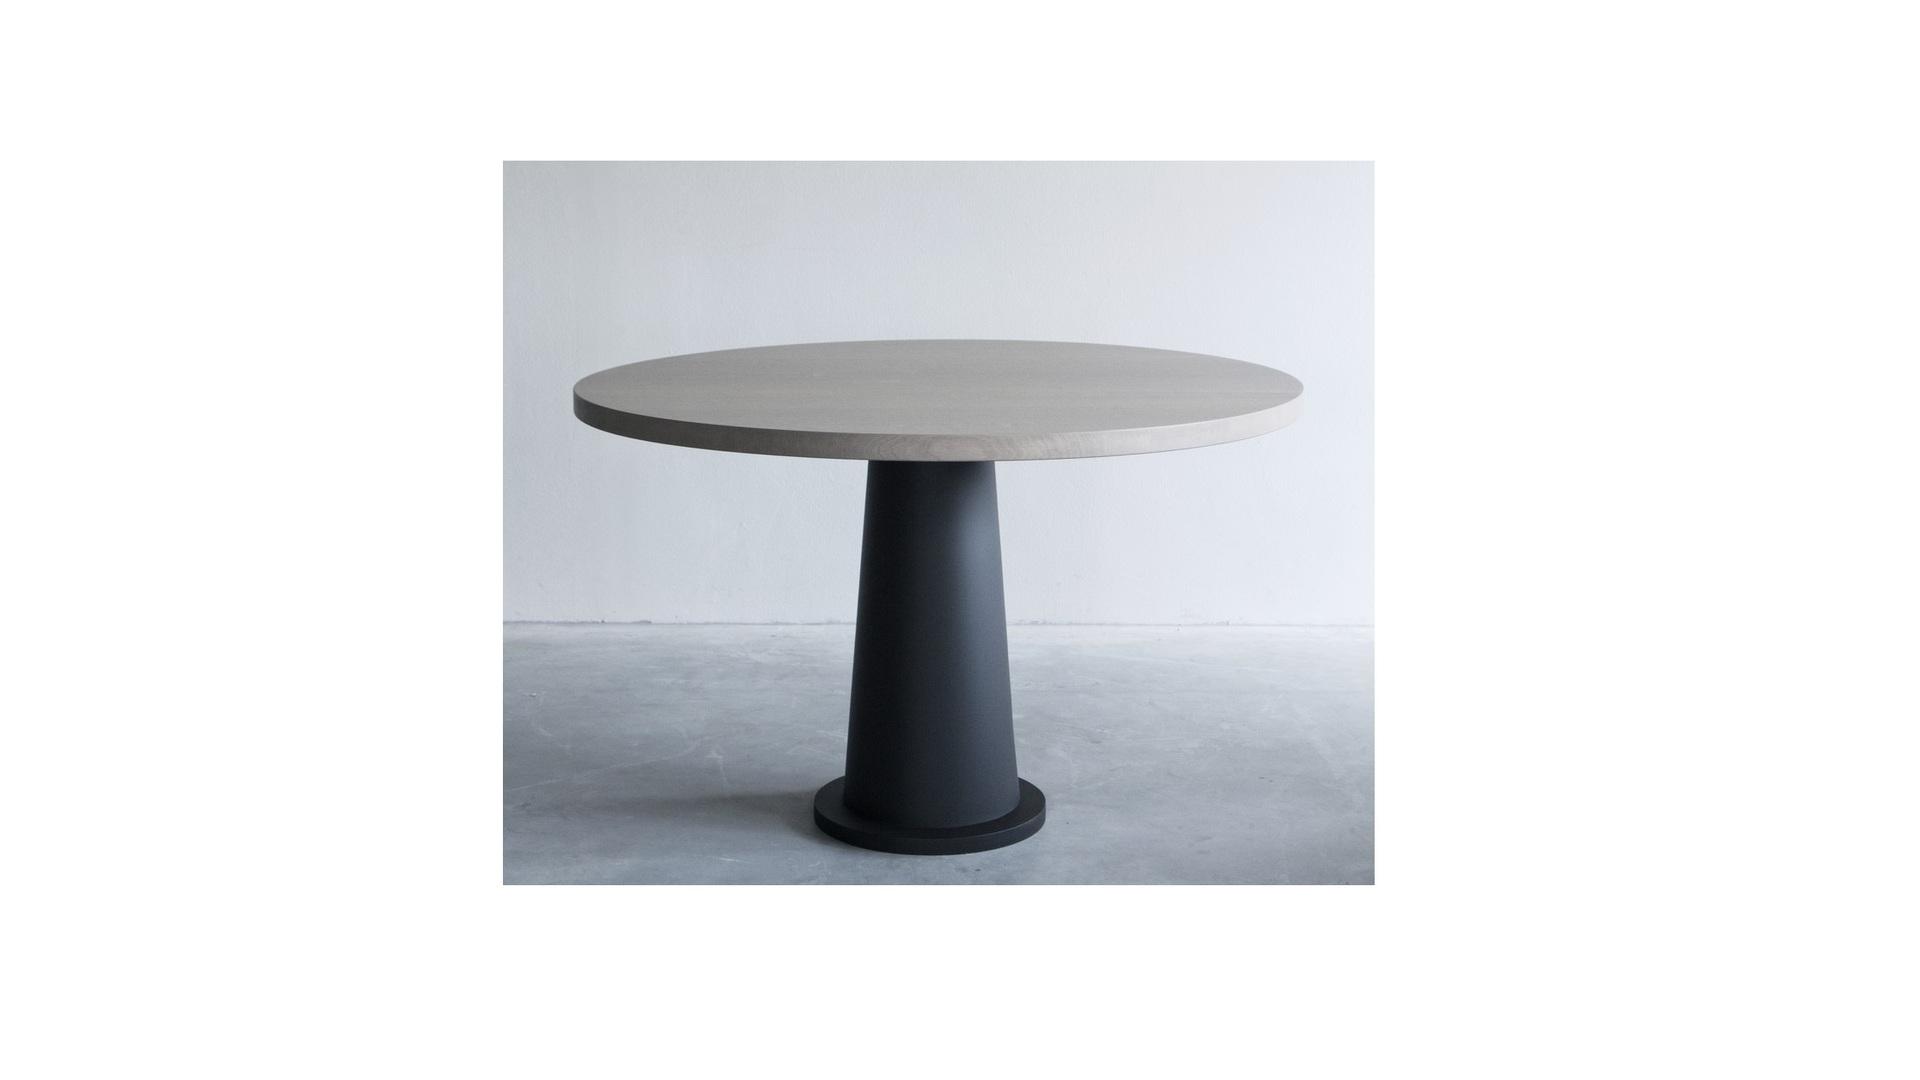 Kops round table with steel base (4) klein.jpg